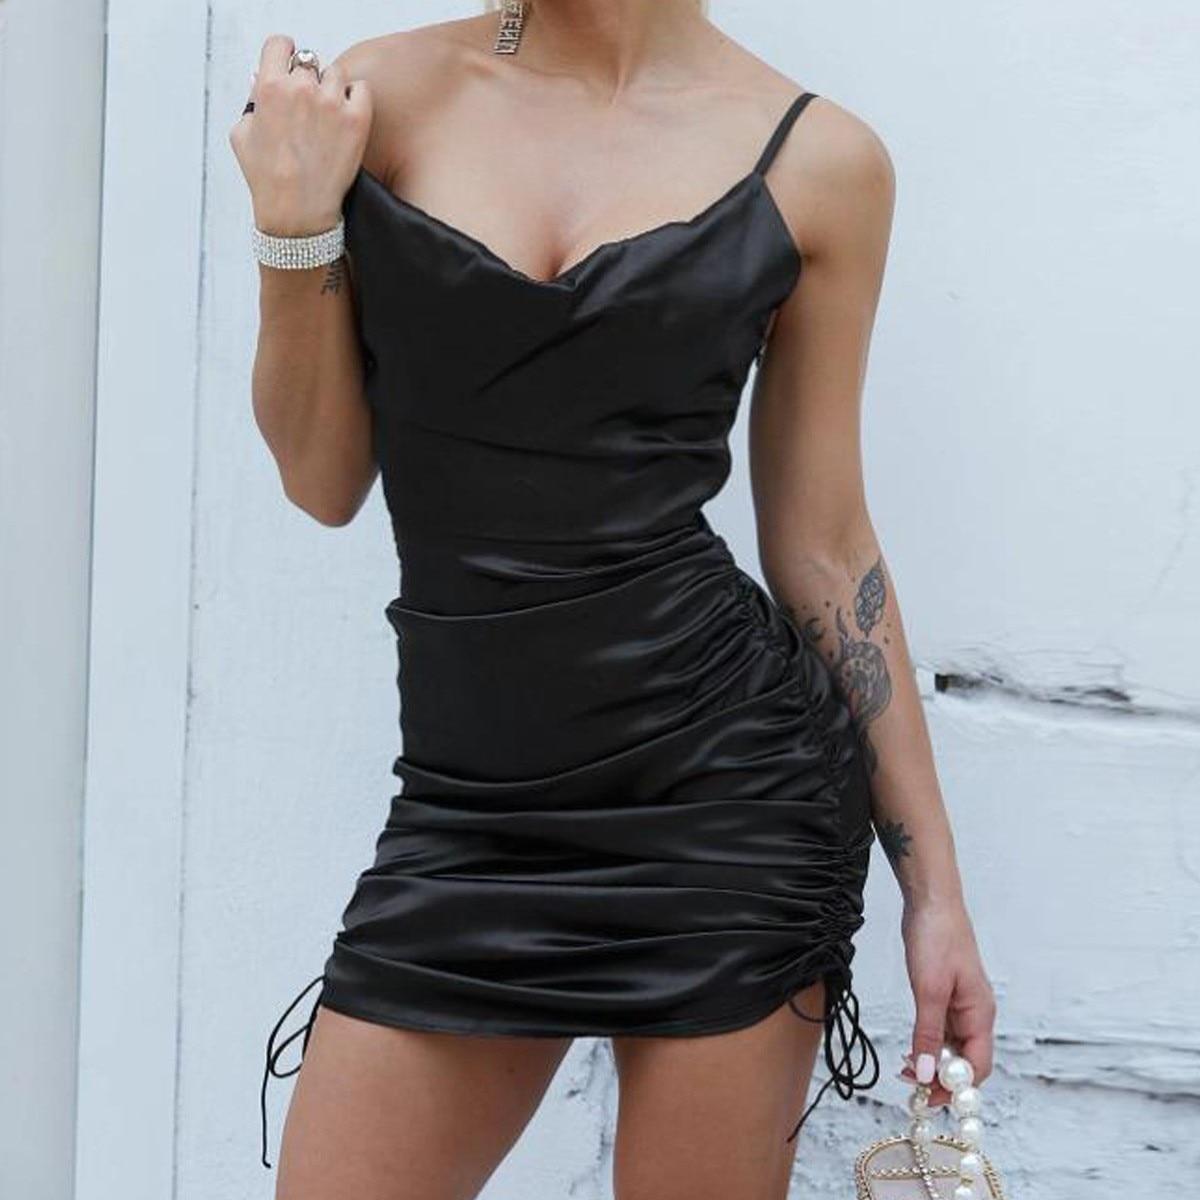 Drawstring sling pleated tight-fitting dress 2021 summer women's sexy hollow mini prom dress casual